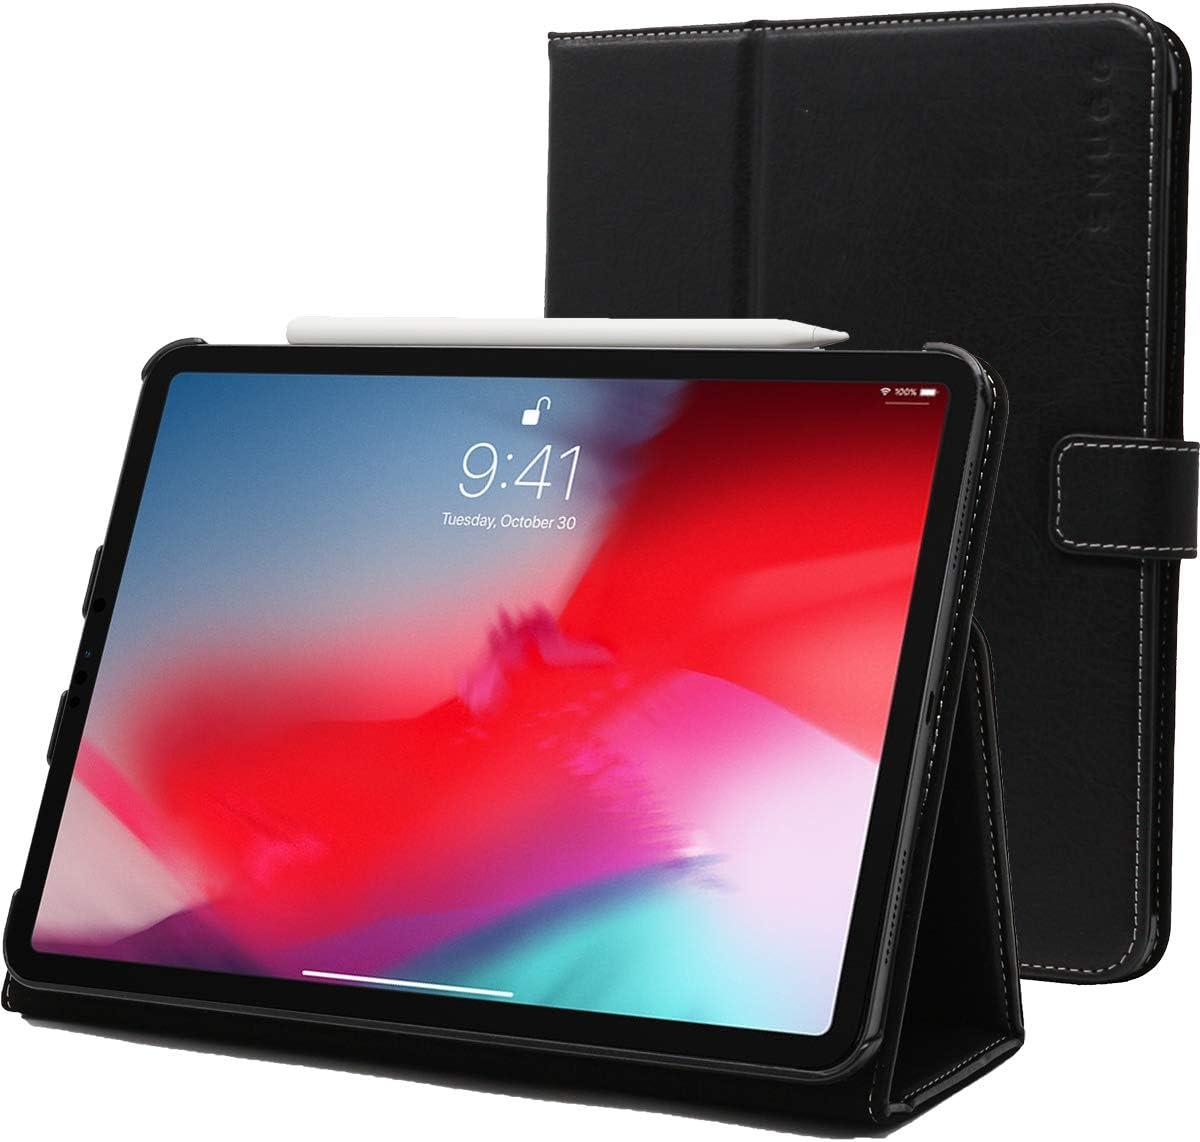 Snugg Funda de cuero cubierta protectora flip stand para apple ipad iPad Pro 11